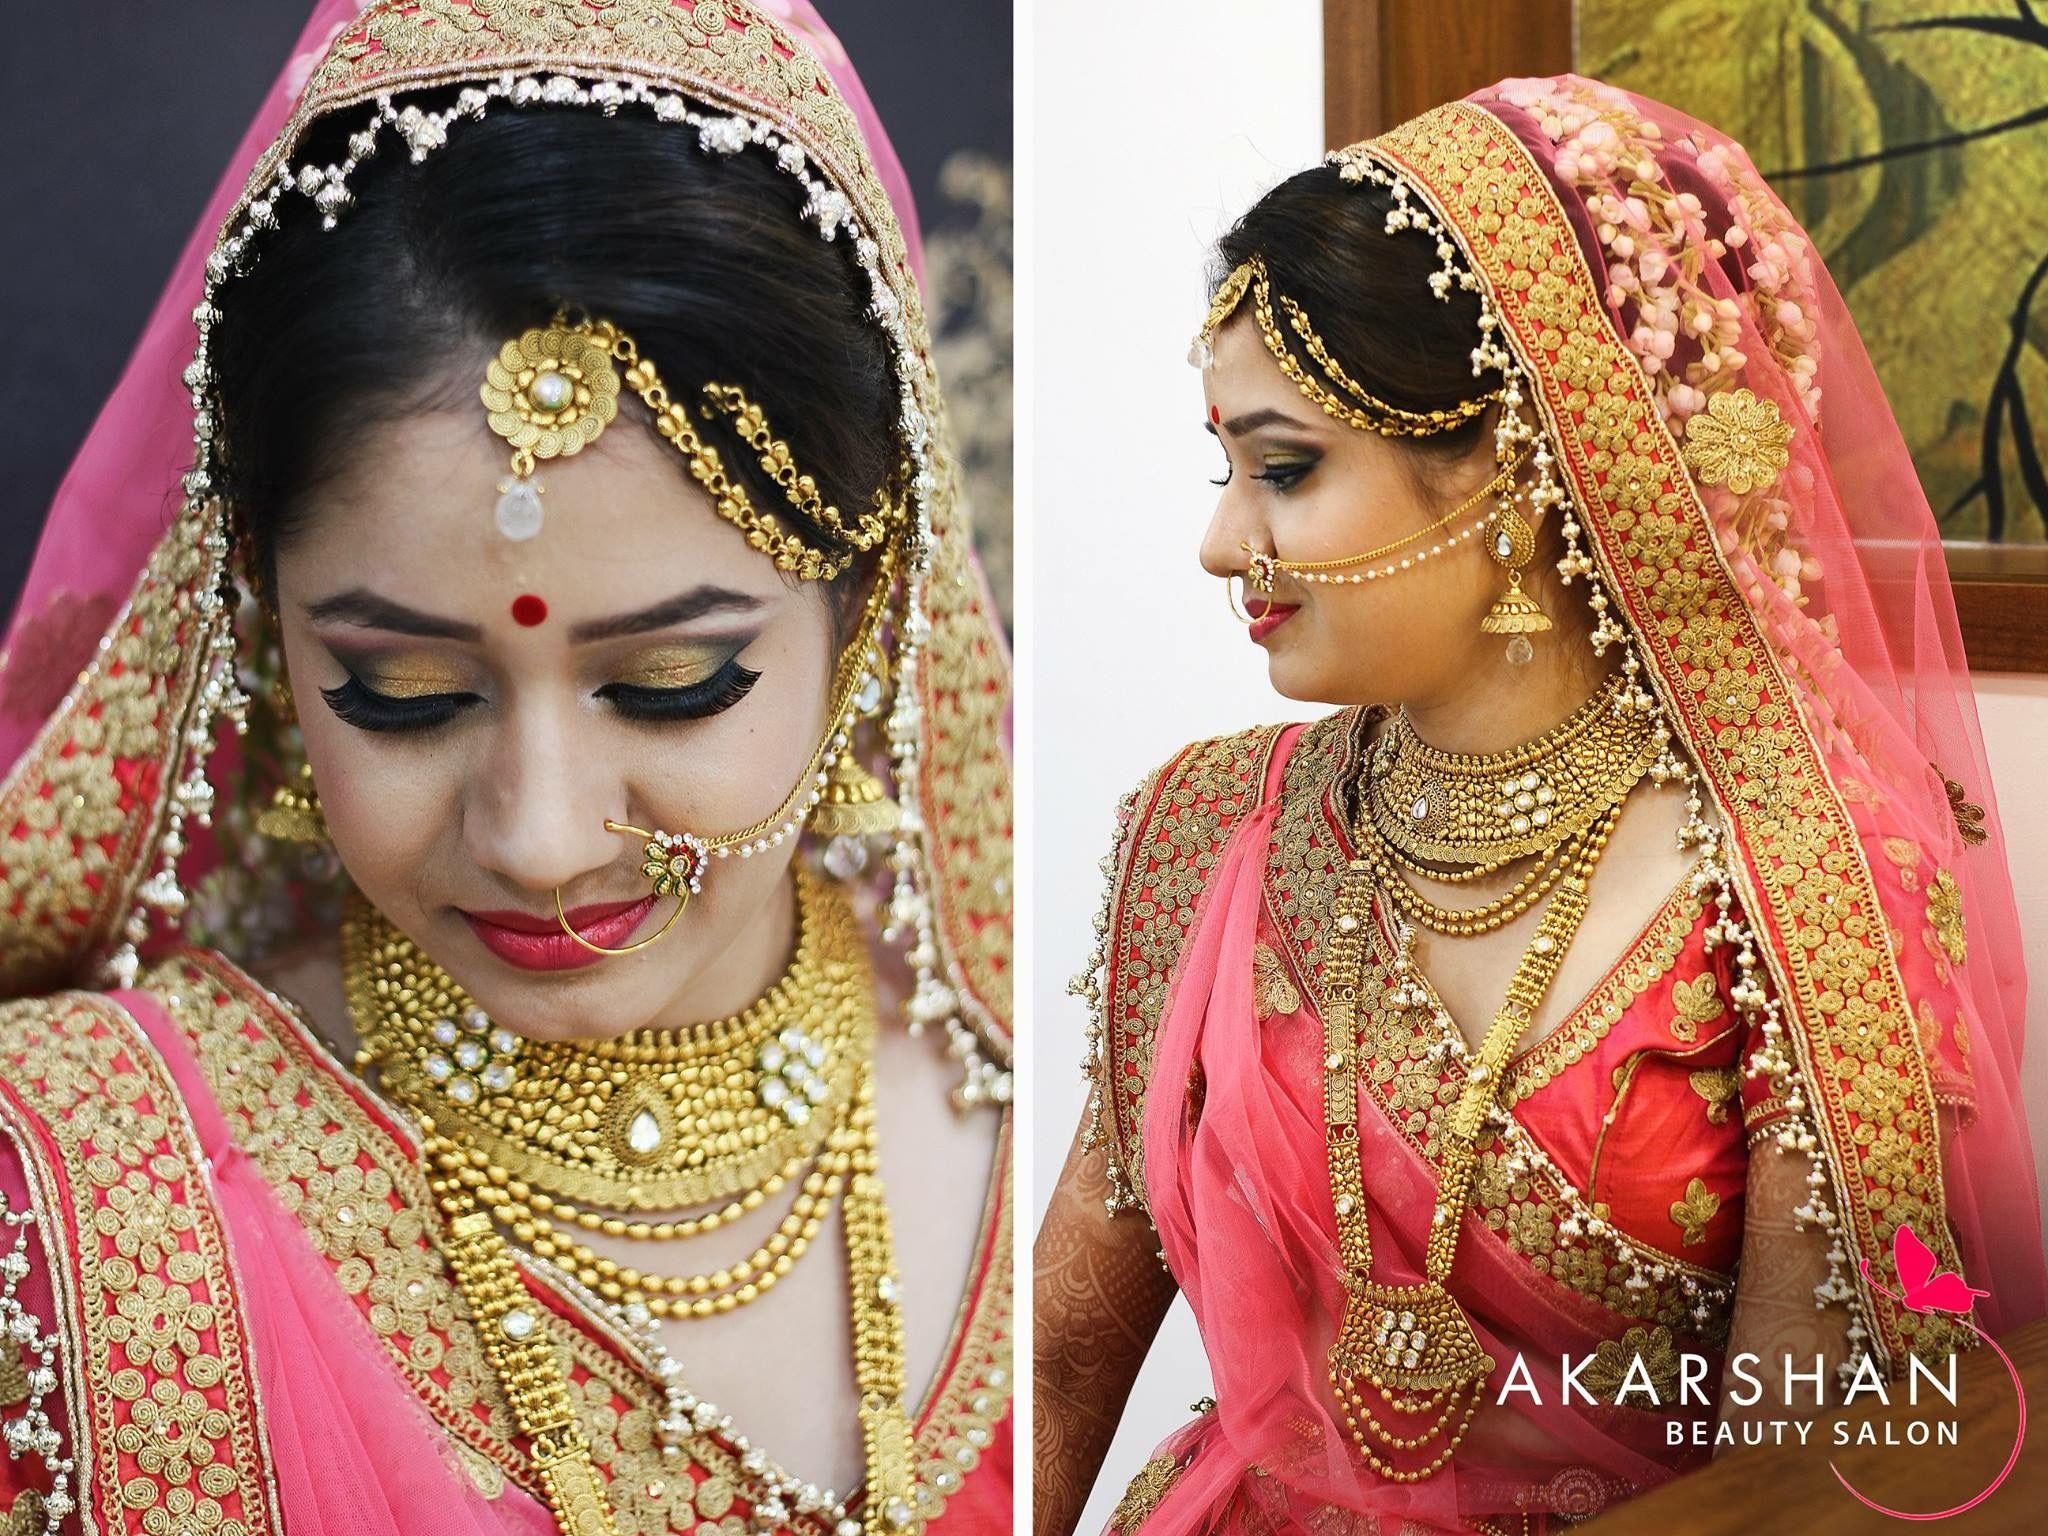 Bridal Makeup By Akarshan Beauty Salon Gwalior Bridal Makeup Akarshan Aakarshan Beautyparlor Beautyparlour Gwalior Bridal Makeup Beauty Salon Beauty